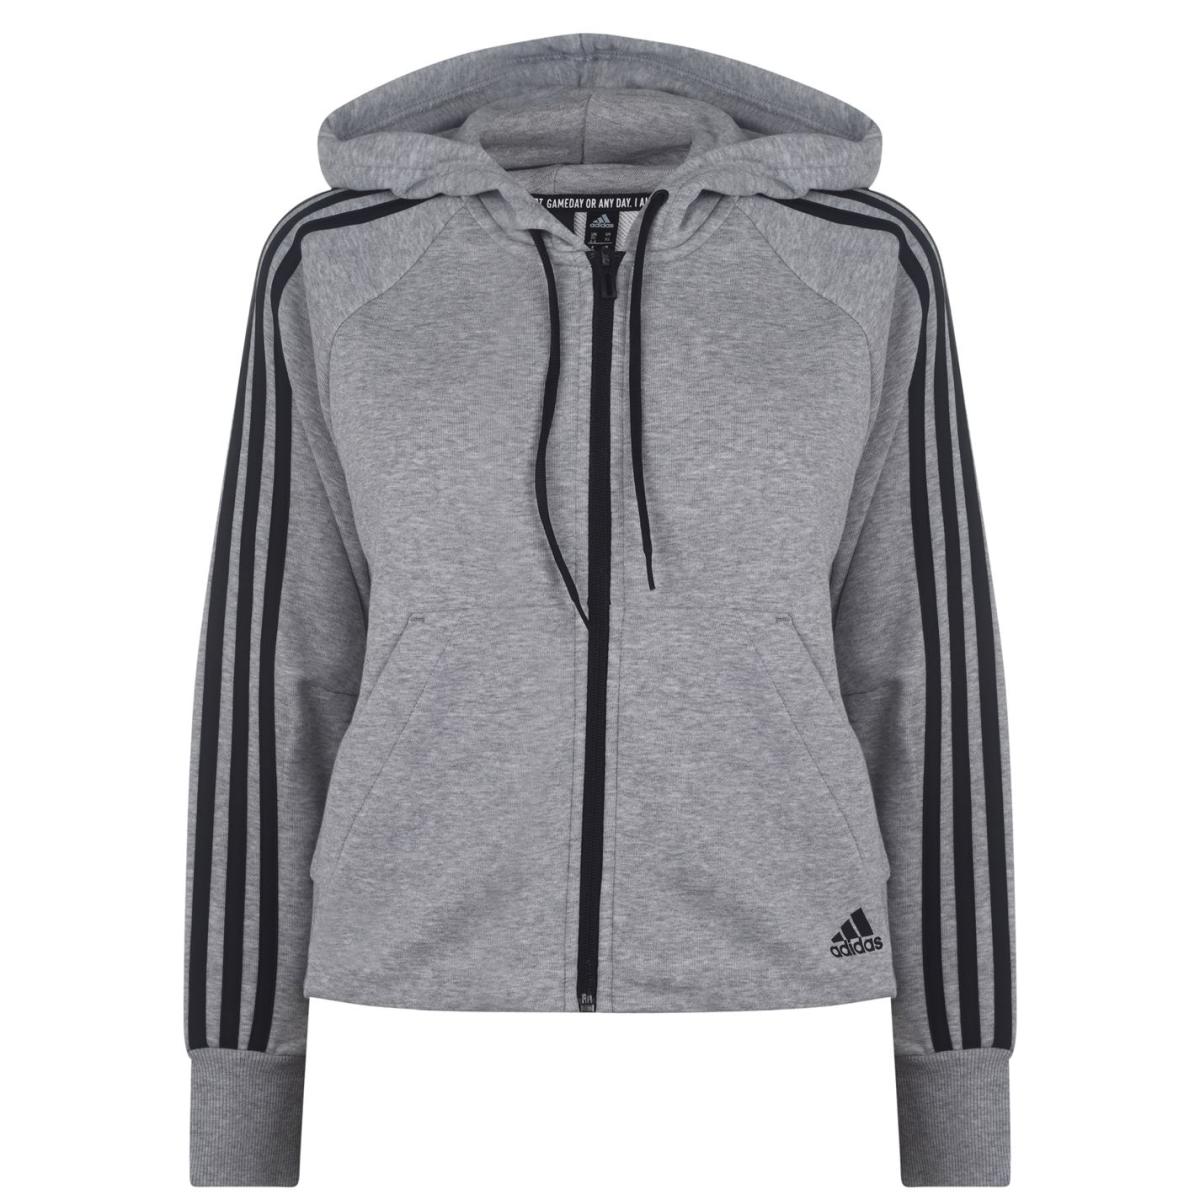 adidas Kapuzenjacke Jacke Kapuzenpullover Damen Sweatshirt Pullover 9266